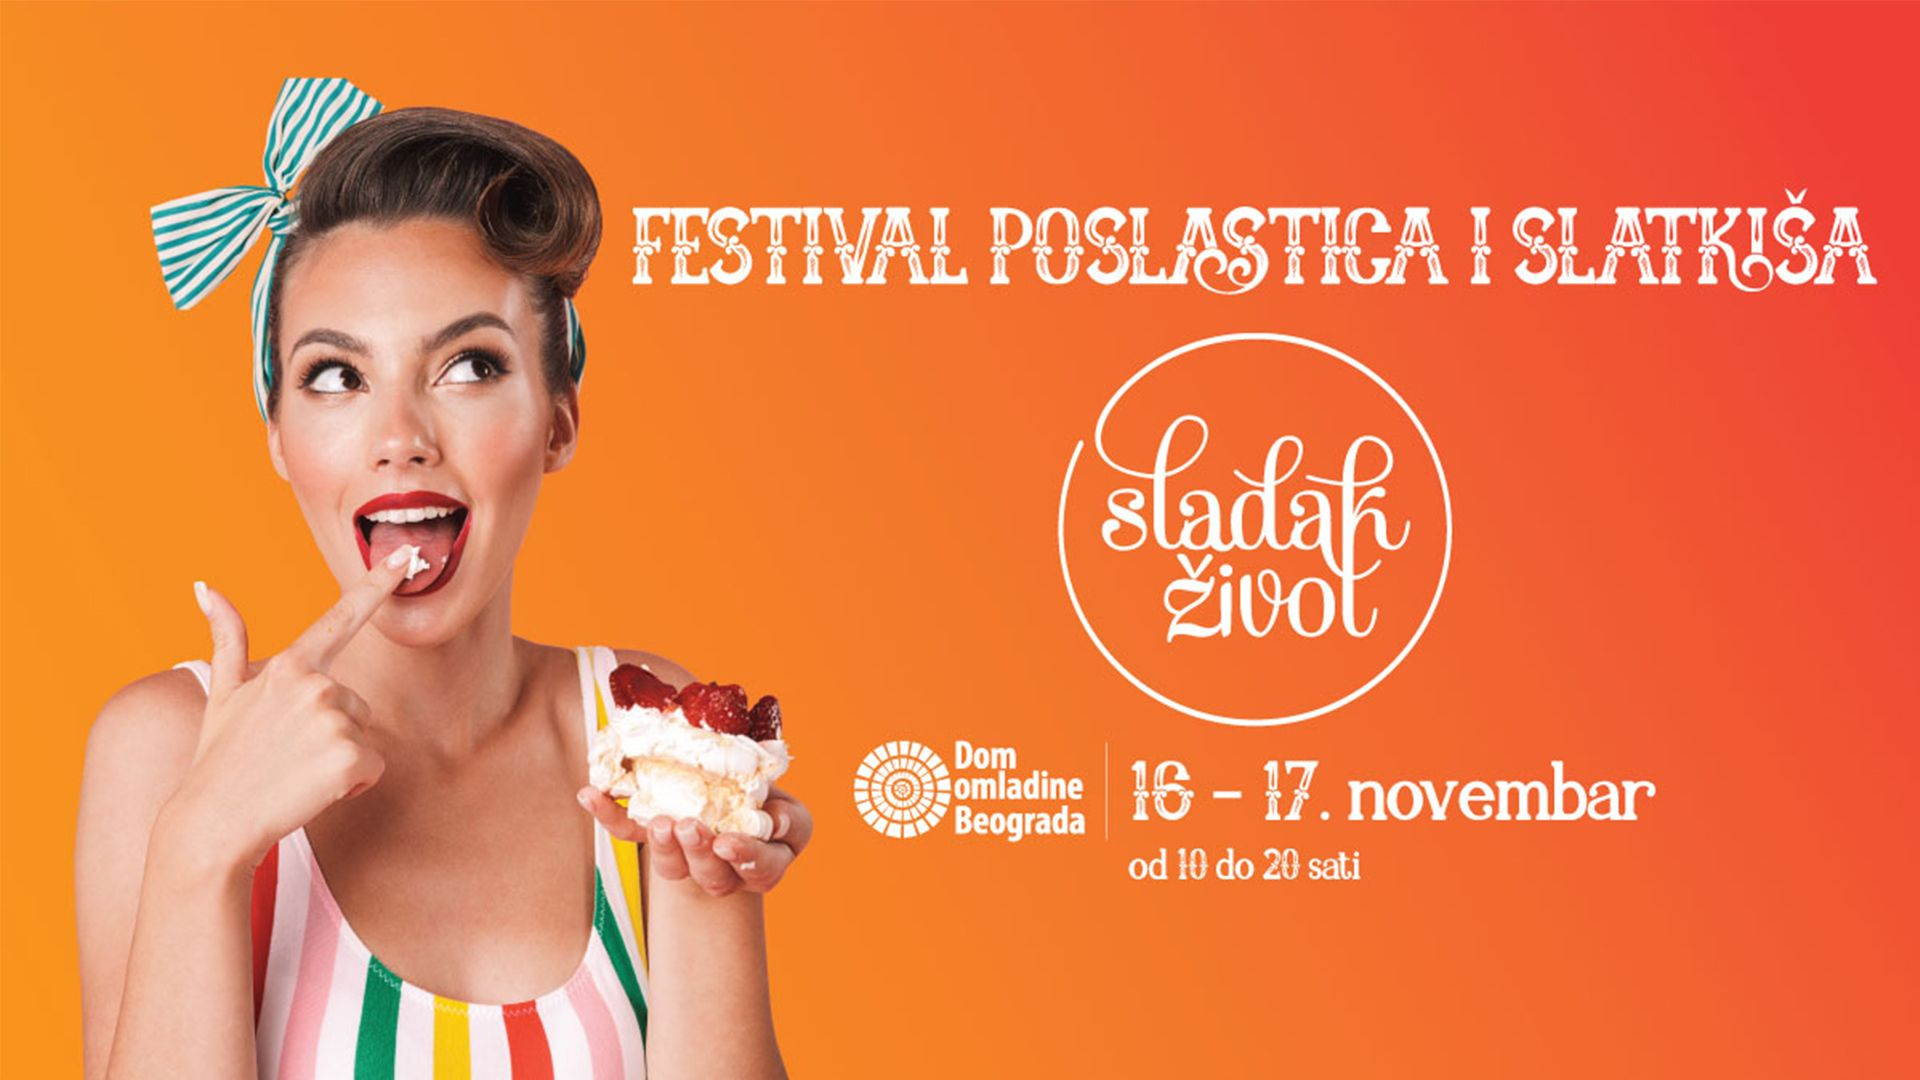 Festival Sladak život, novembar 2019.